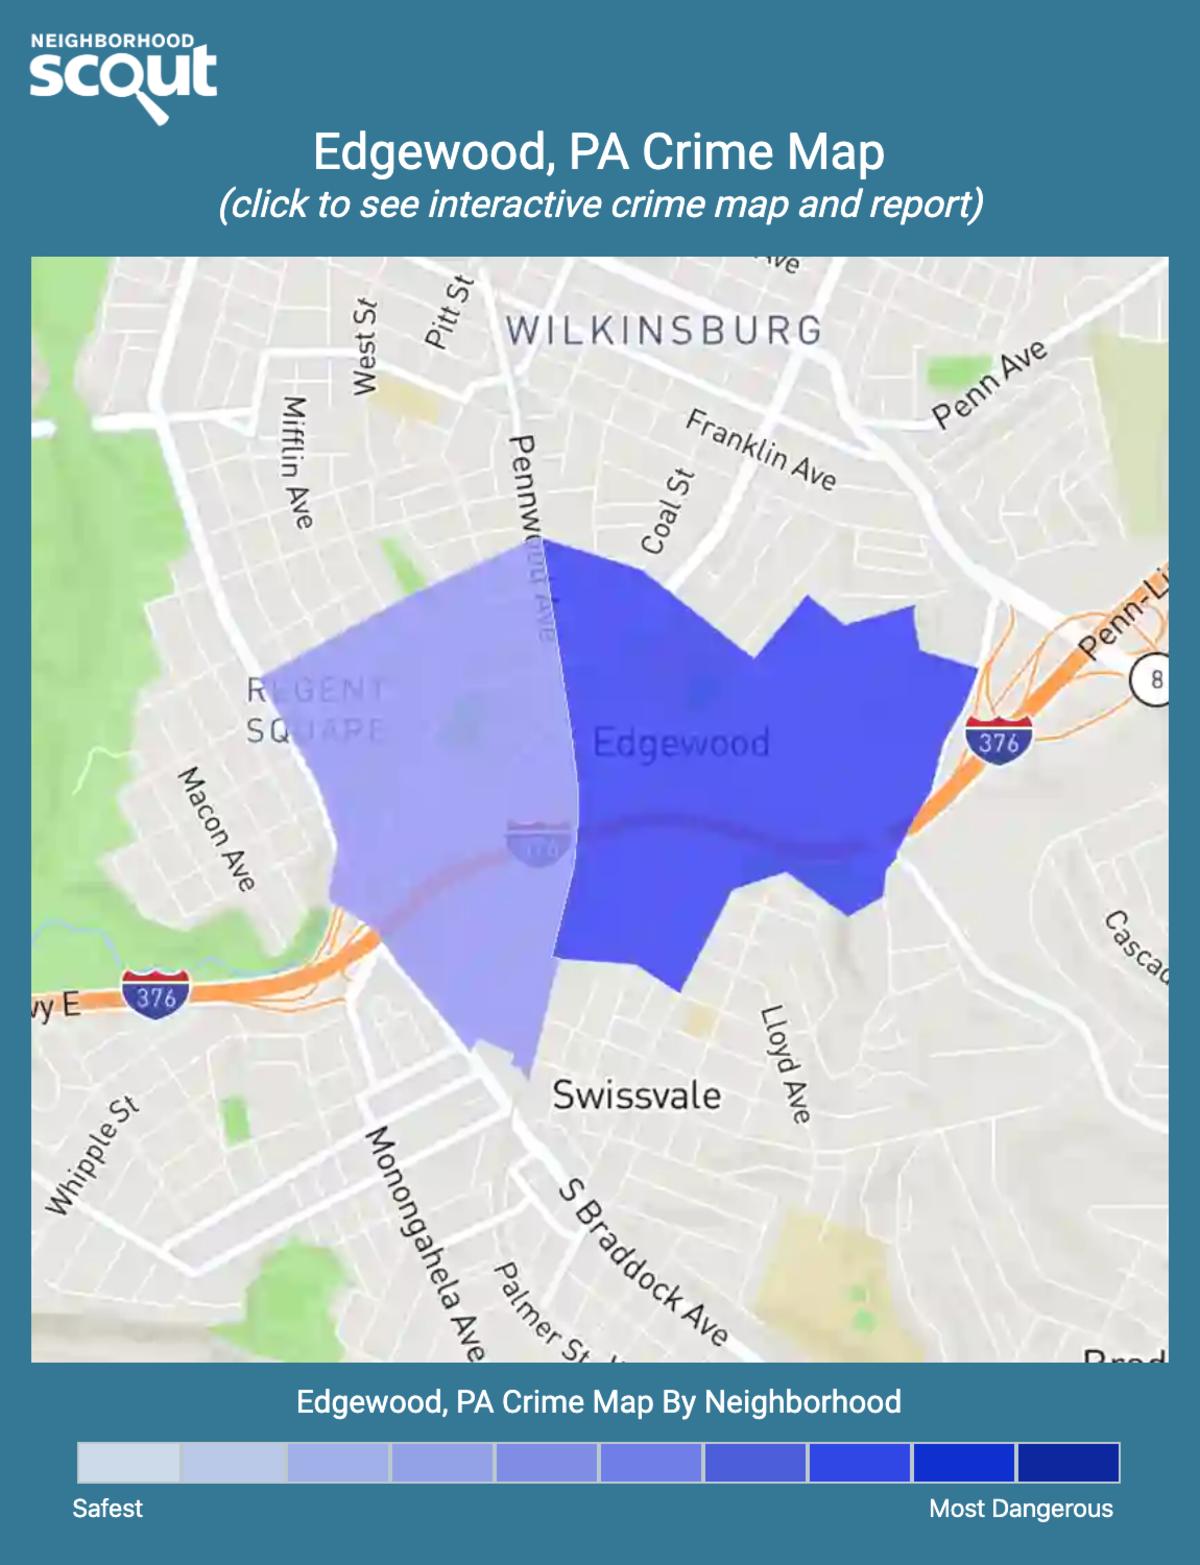 Edgewood, Pennsylvania crime map